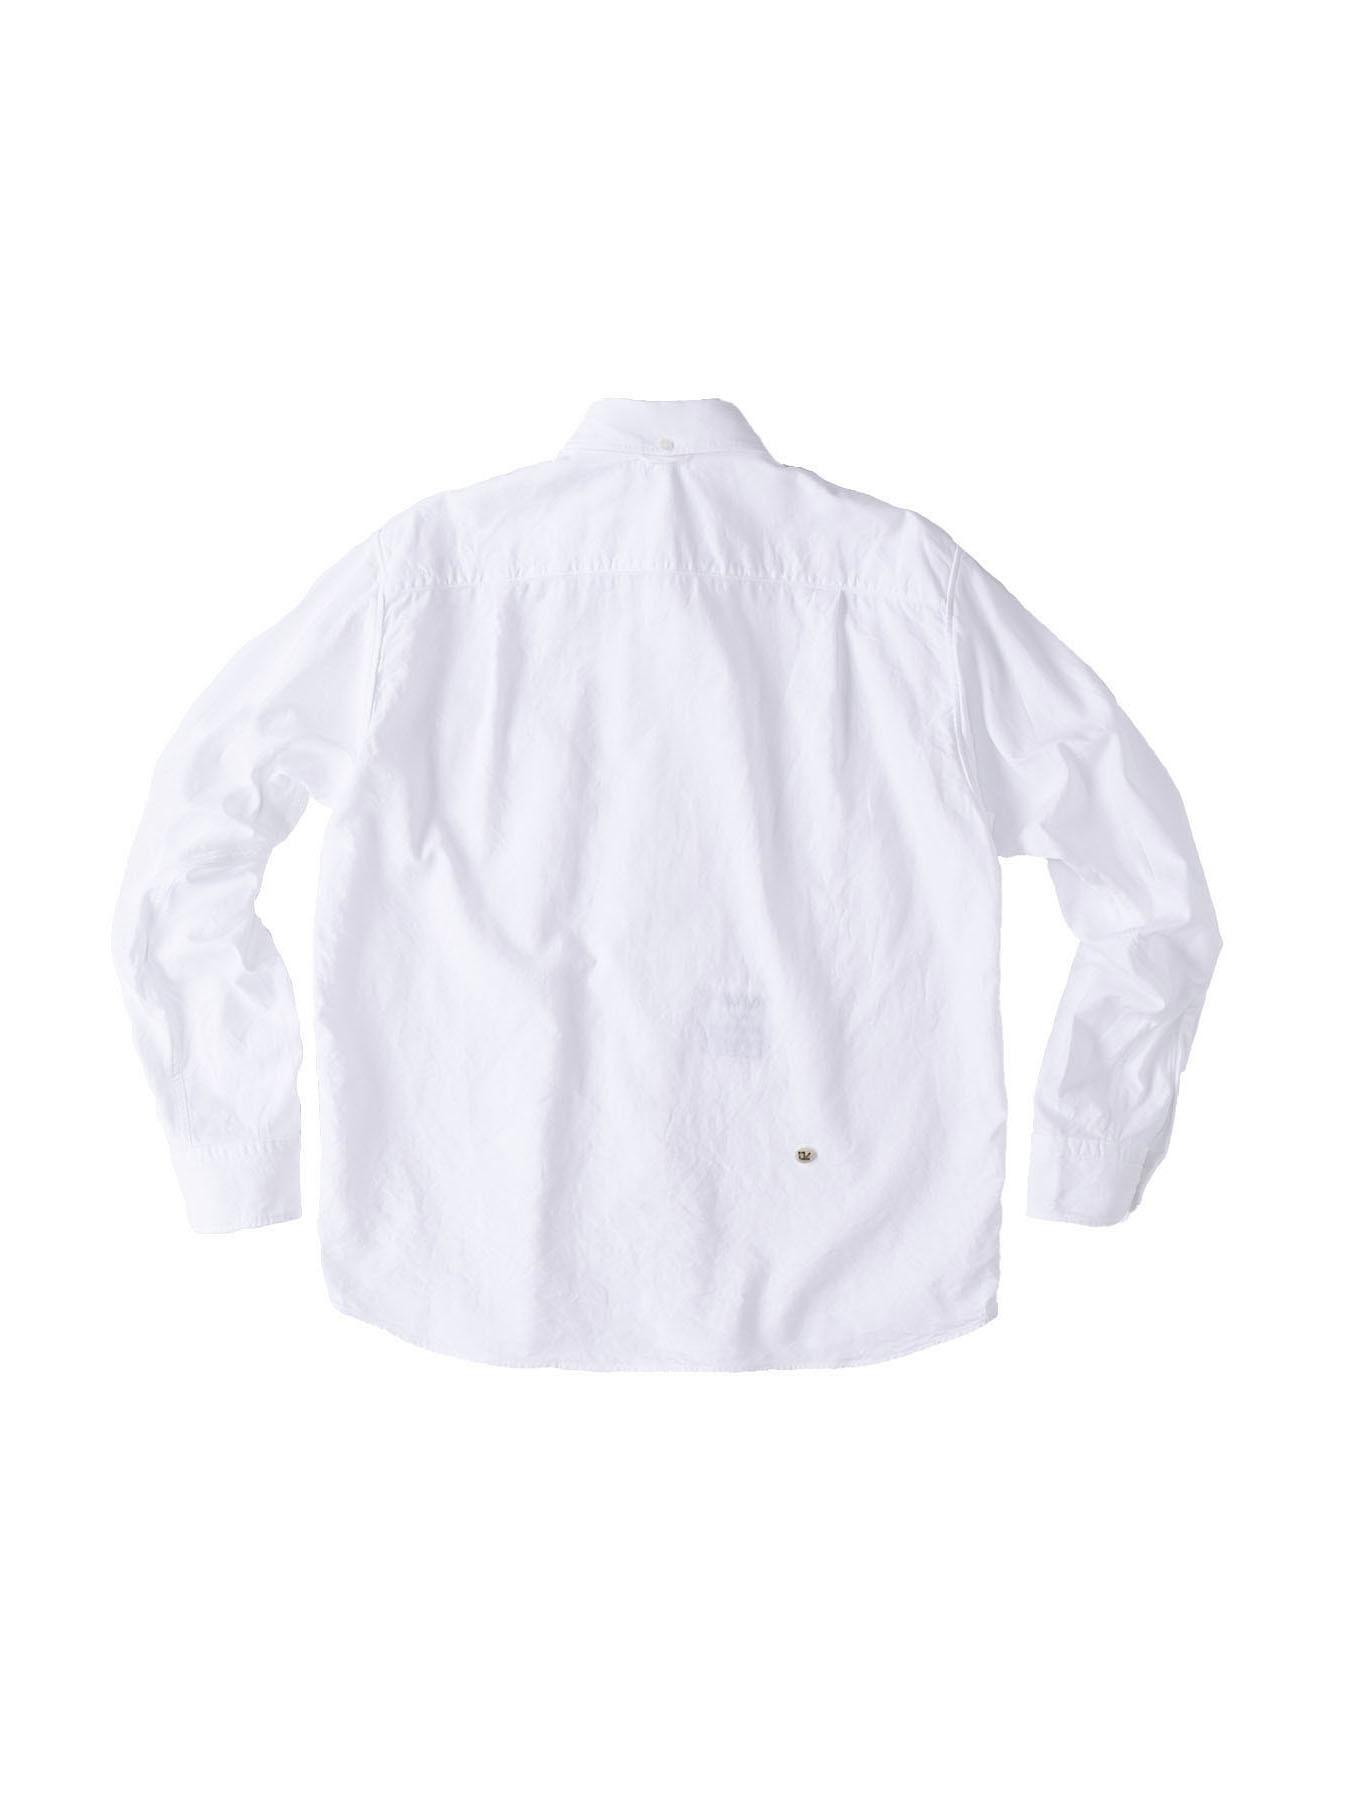 Gauze 908 Ocean Shirt-5